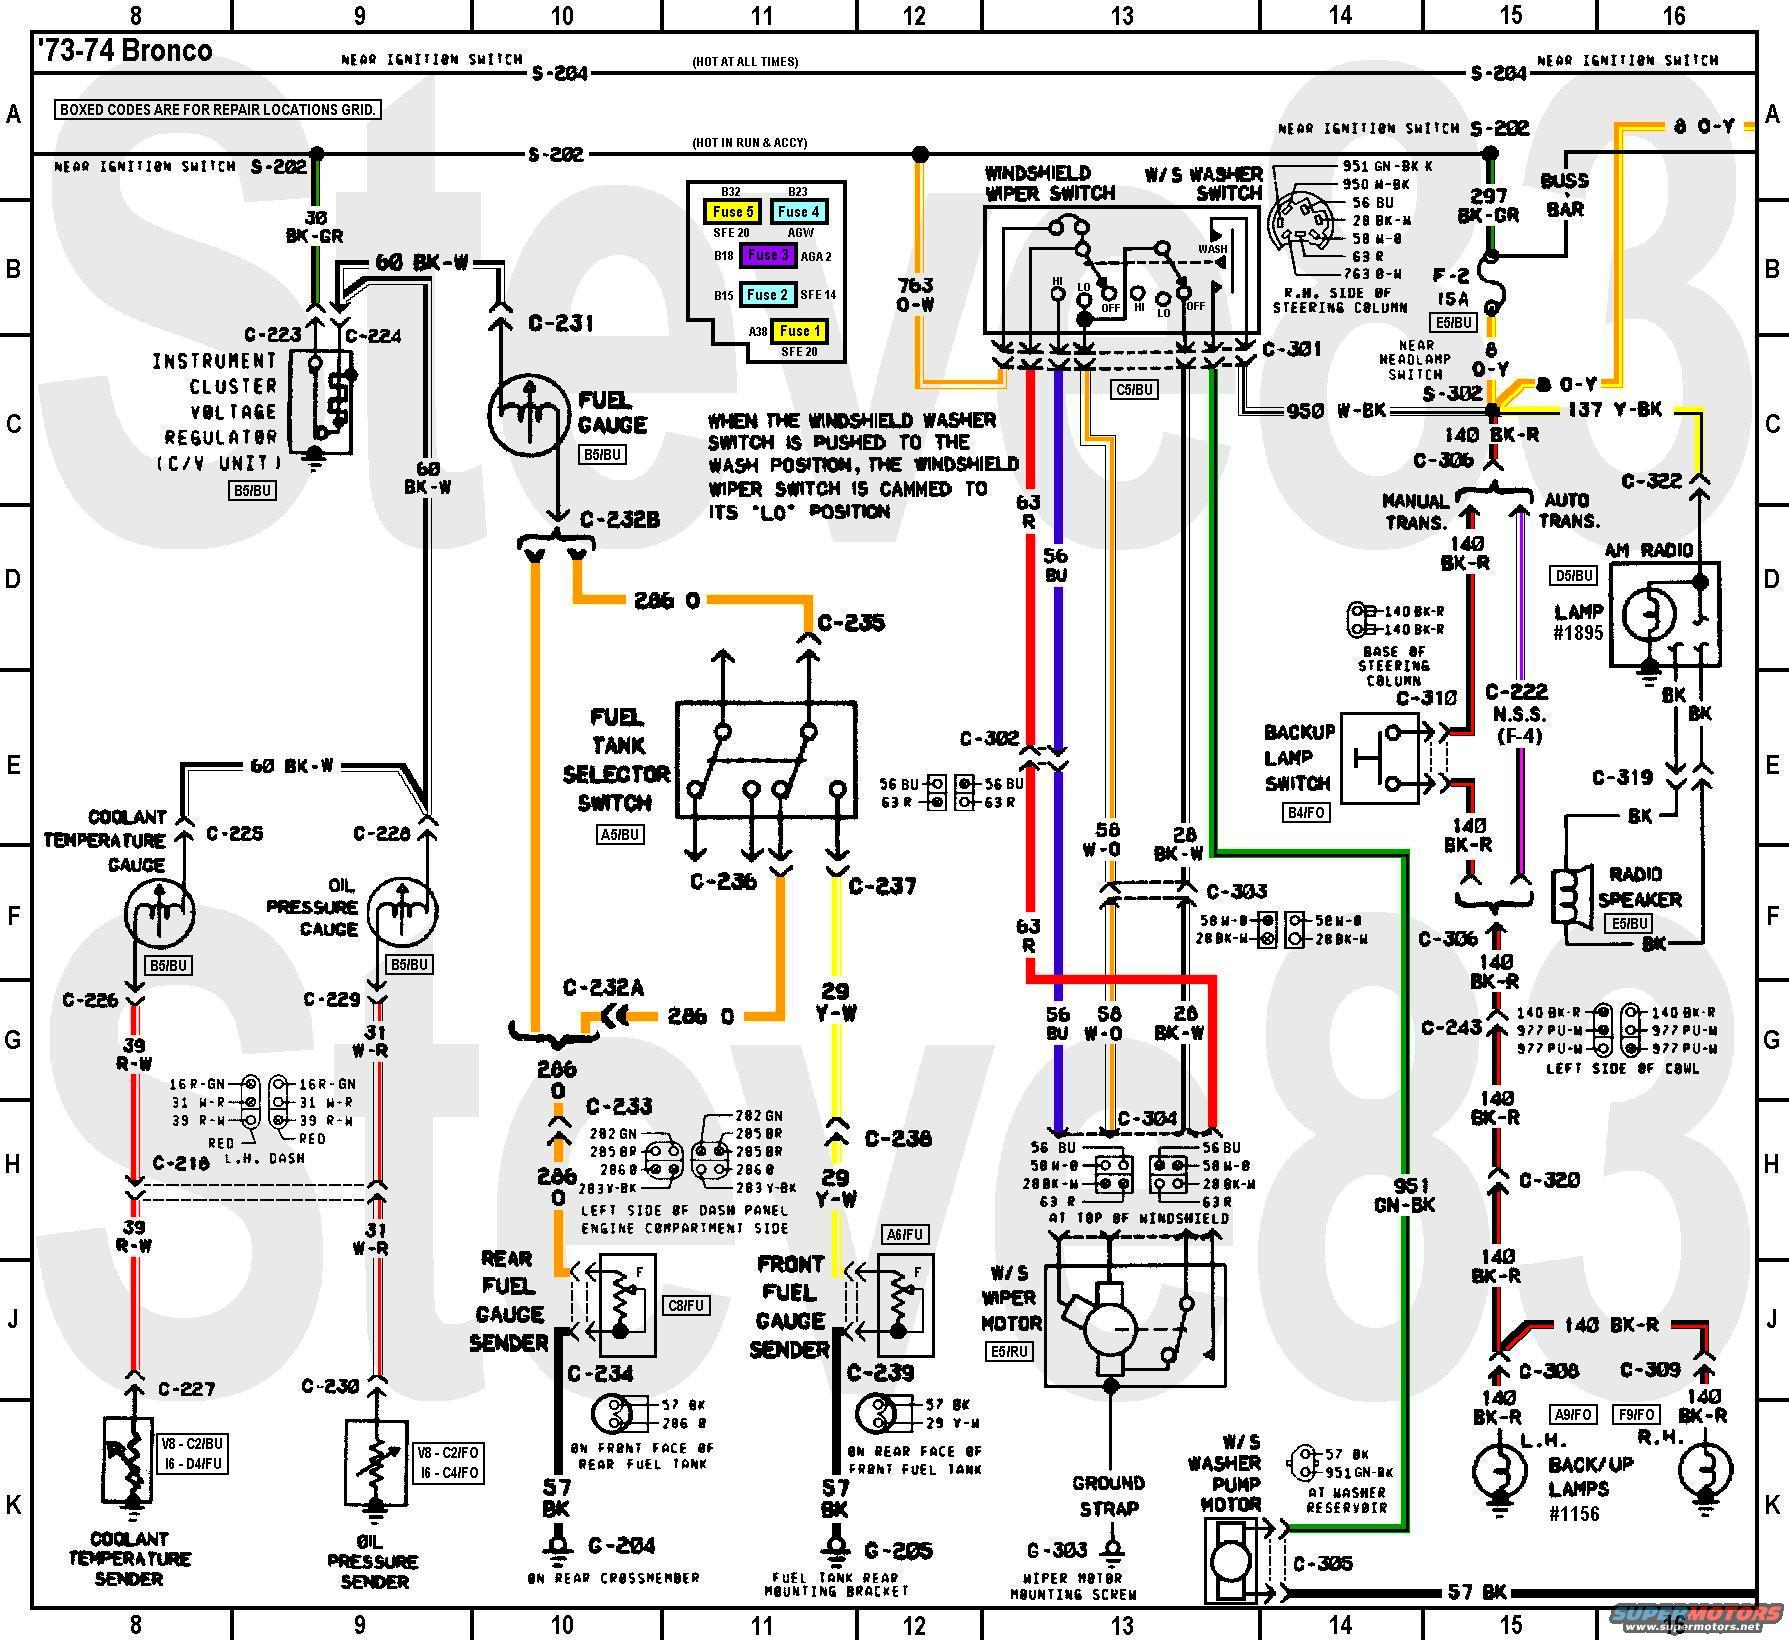 radio wiring diagram mitsubishi outlander wiring library Mitsubishi L200 Workshop Manual th?id\u003doip 0auwjcsg9au8uq__v_igmgefdv\u0026pid\u003d15 1 1990 mitsubishi triton radio 2006 mitsubishi eclipse radio wiring diagram